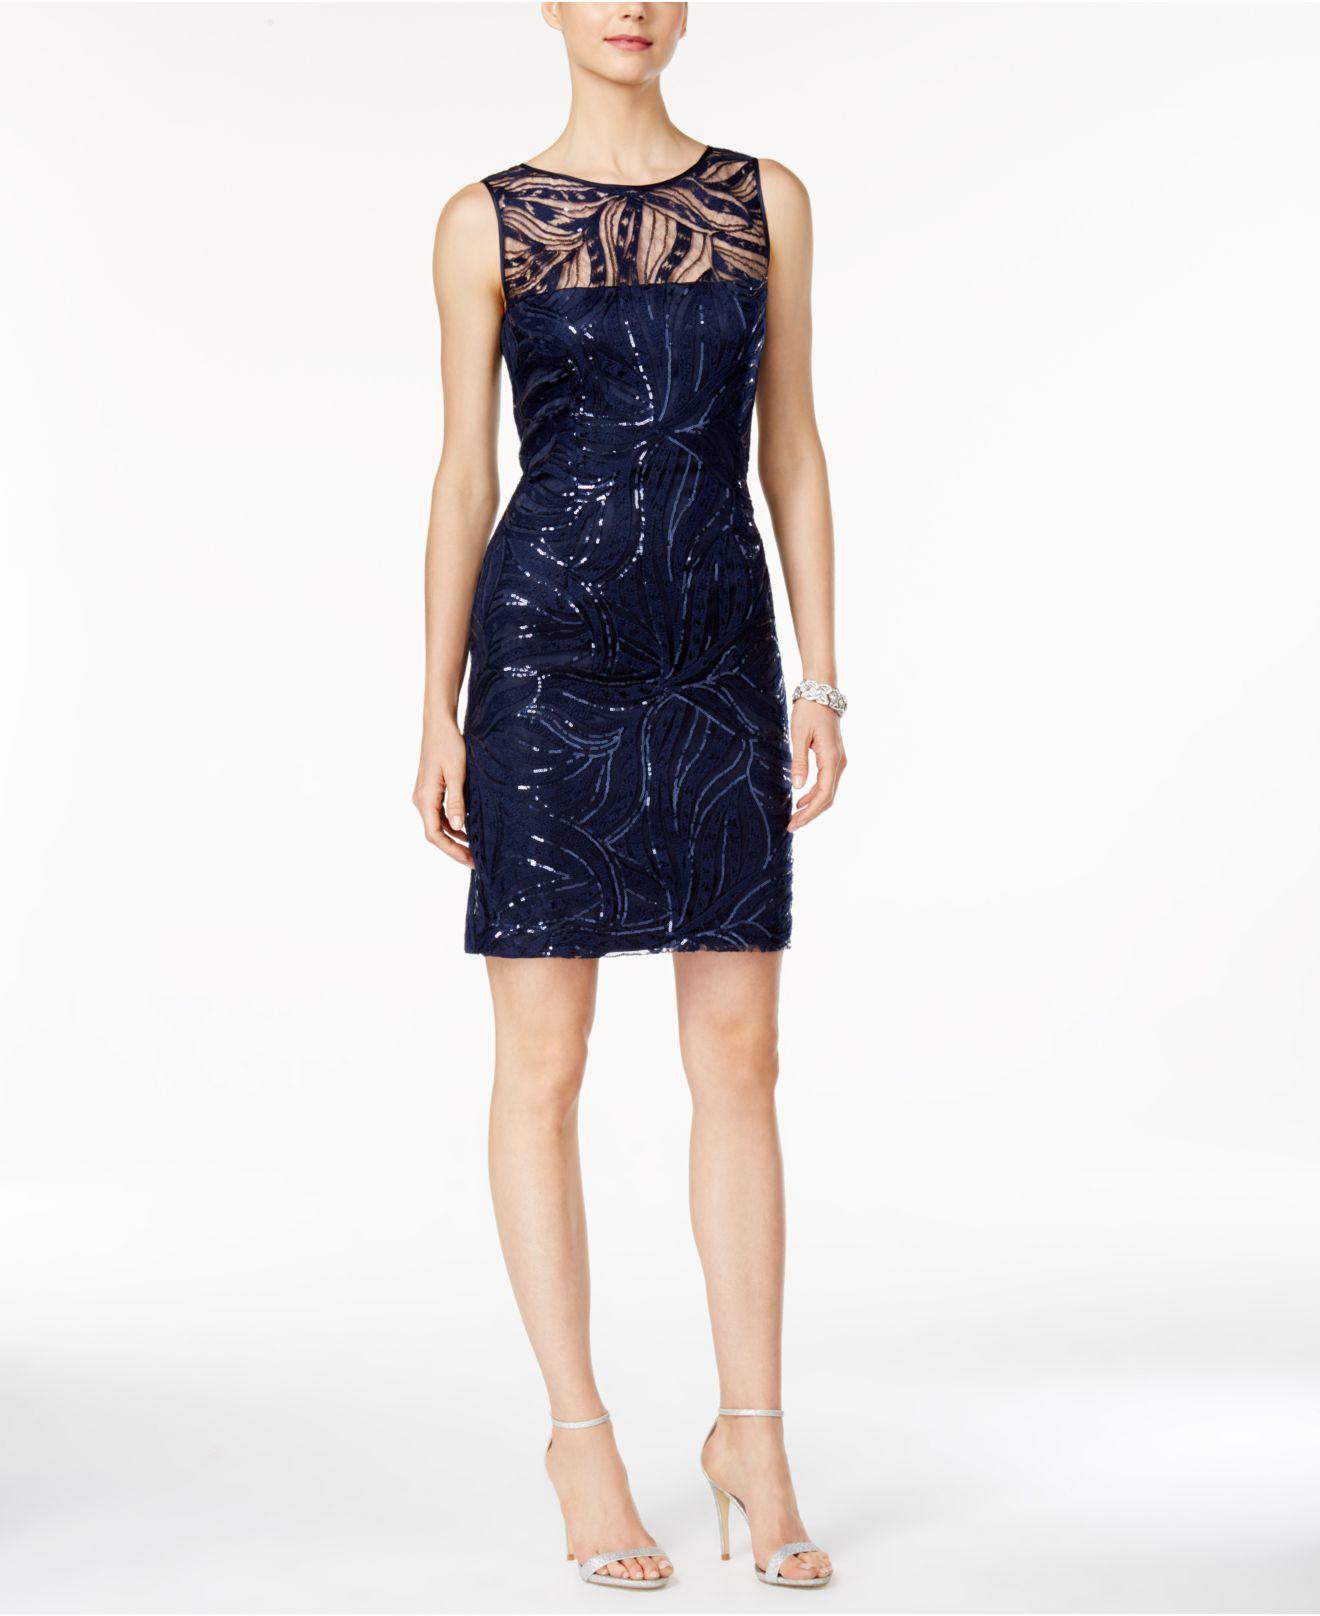 Macys Navy Blue Dresses: Tahari Sequined Illusion Sheath Dress In Blue (Navy)